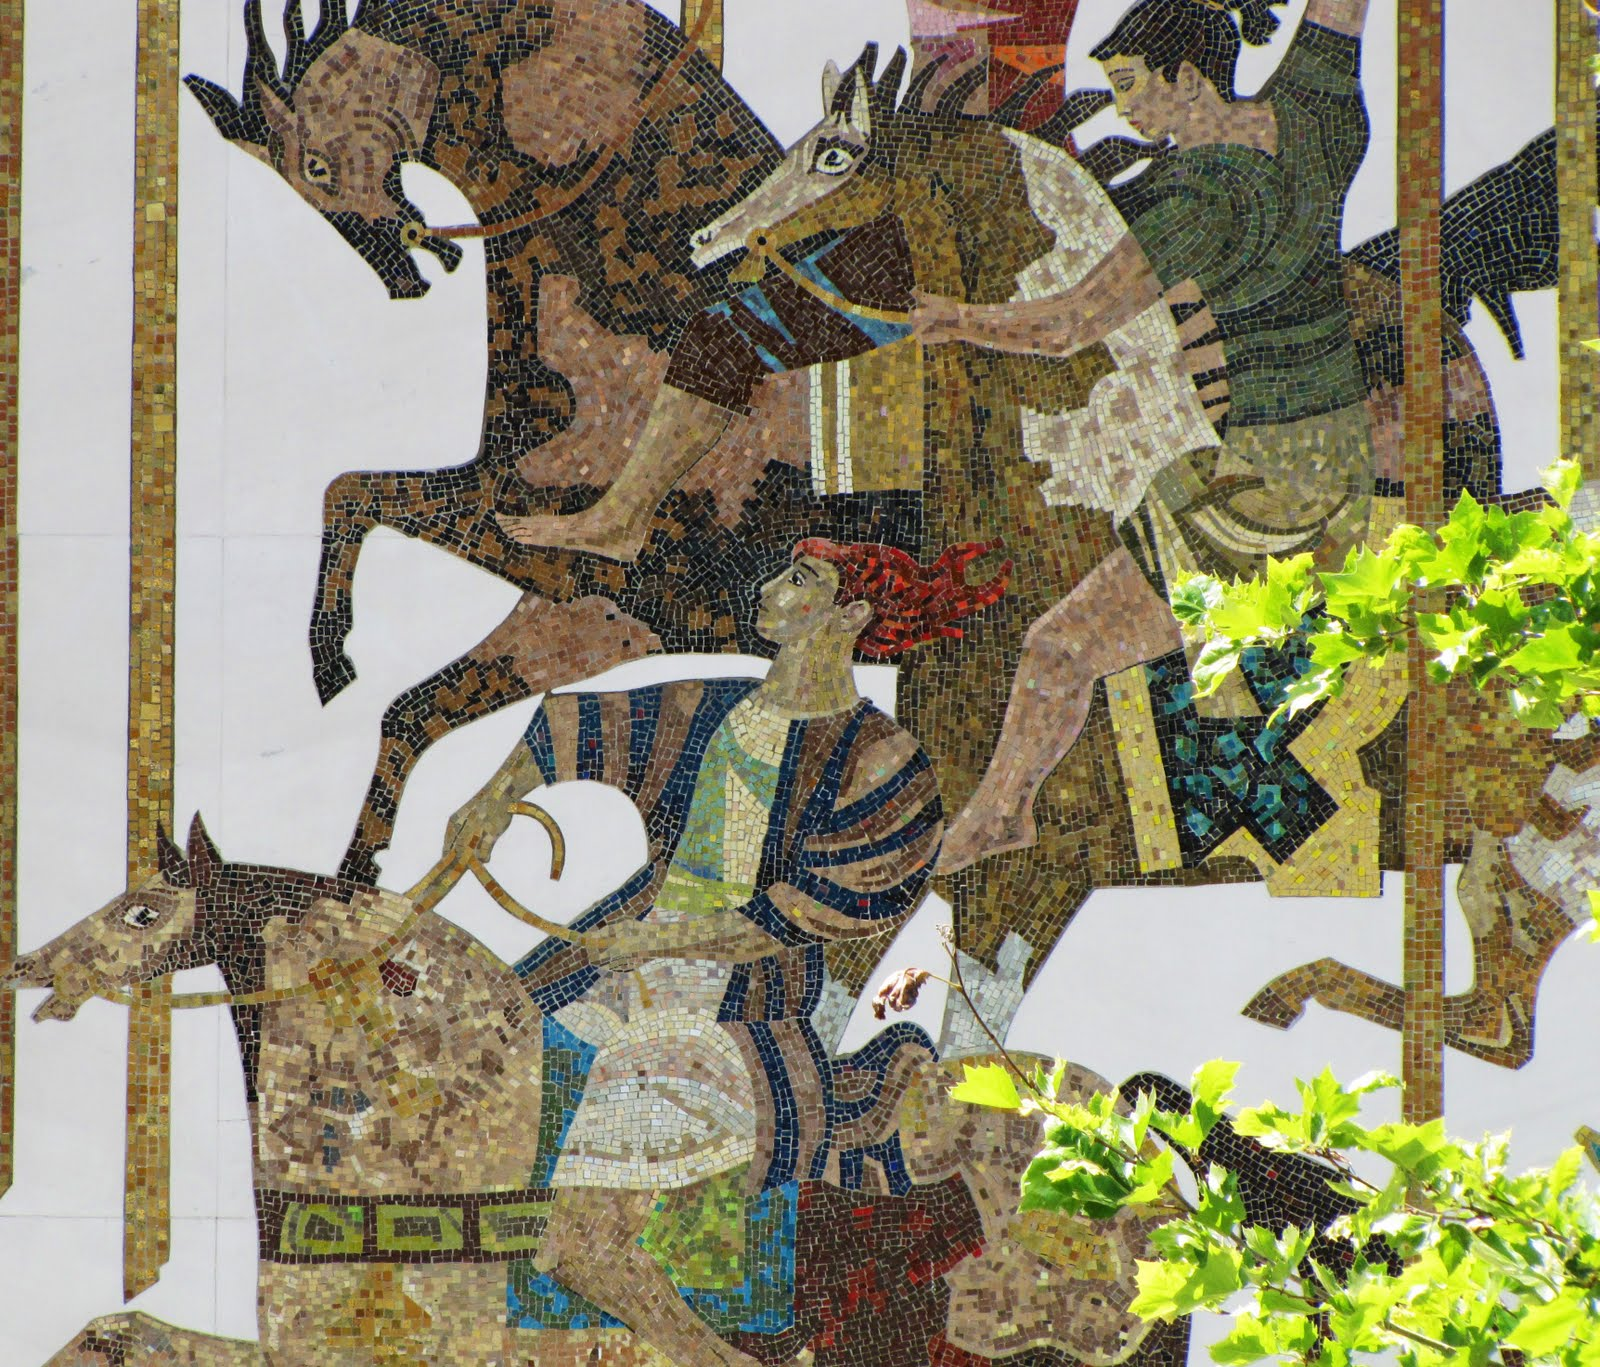 Millard Sheets Studio and Ravenna Mosaic Company, mosaic for Home Savings, Arcadia, 1959-1960. Image courtesy of M. Danko.